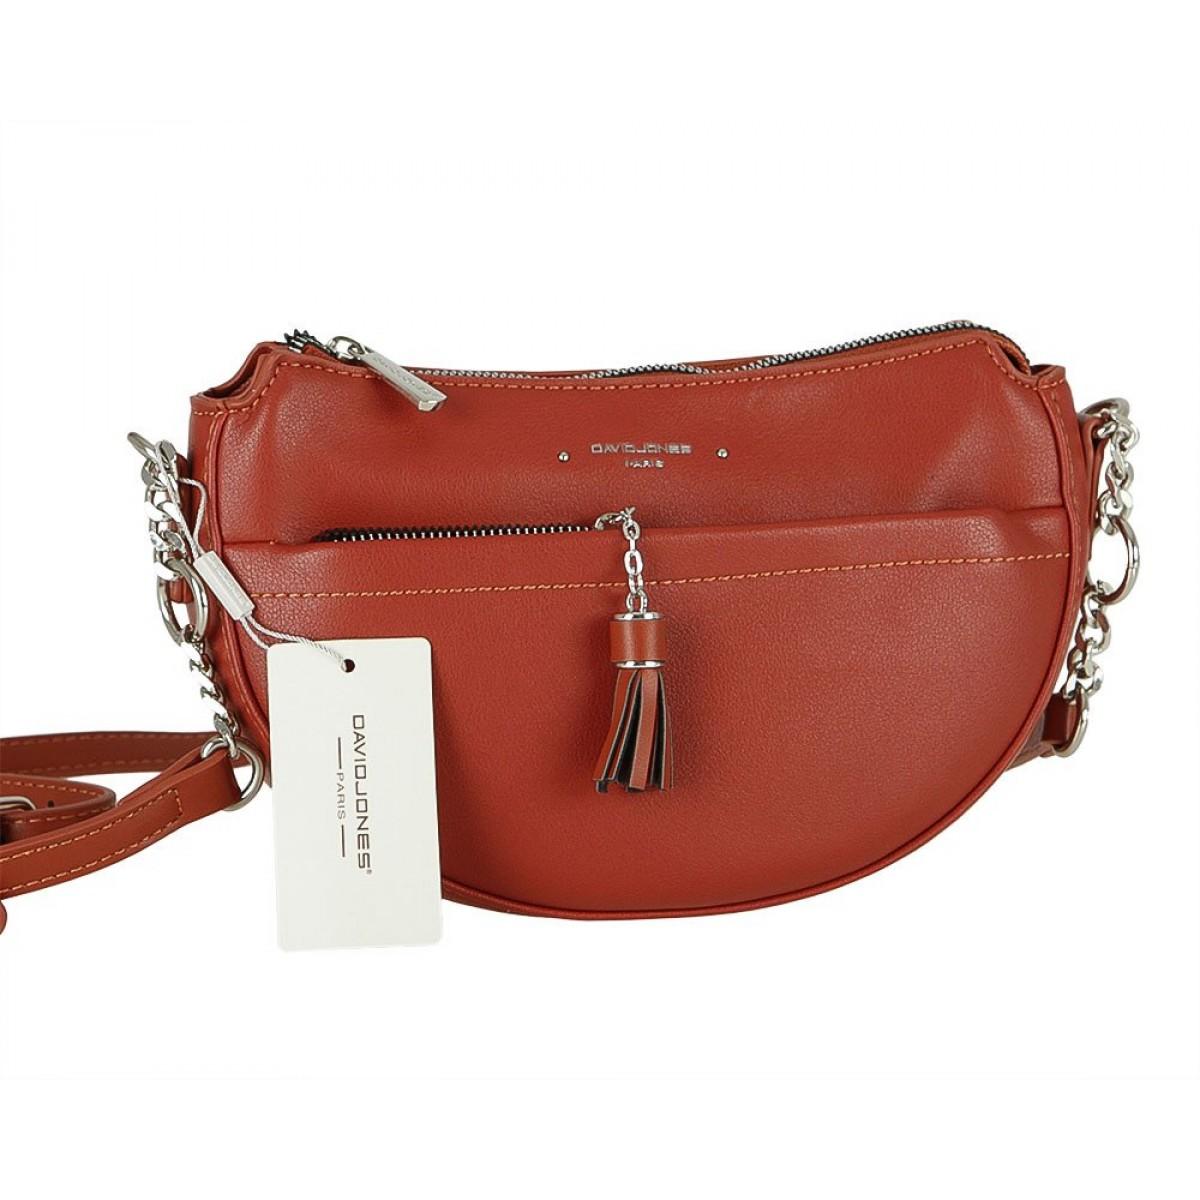 Жіноча сумка David Jones 6415-2 SIENNA